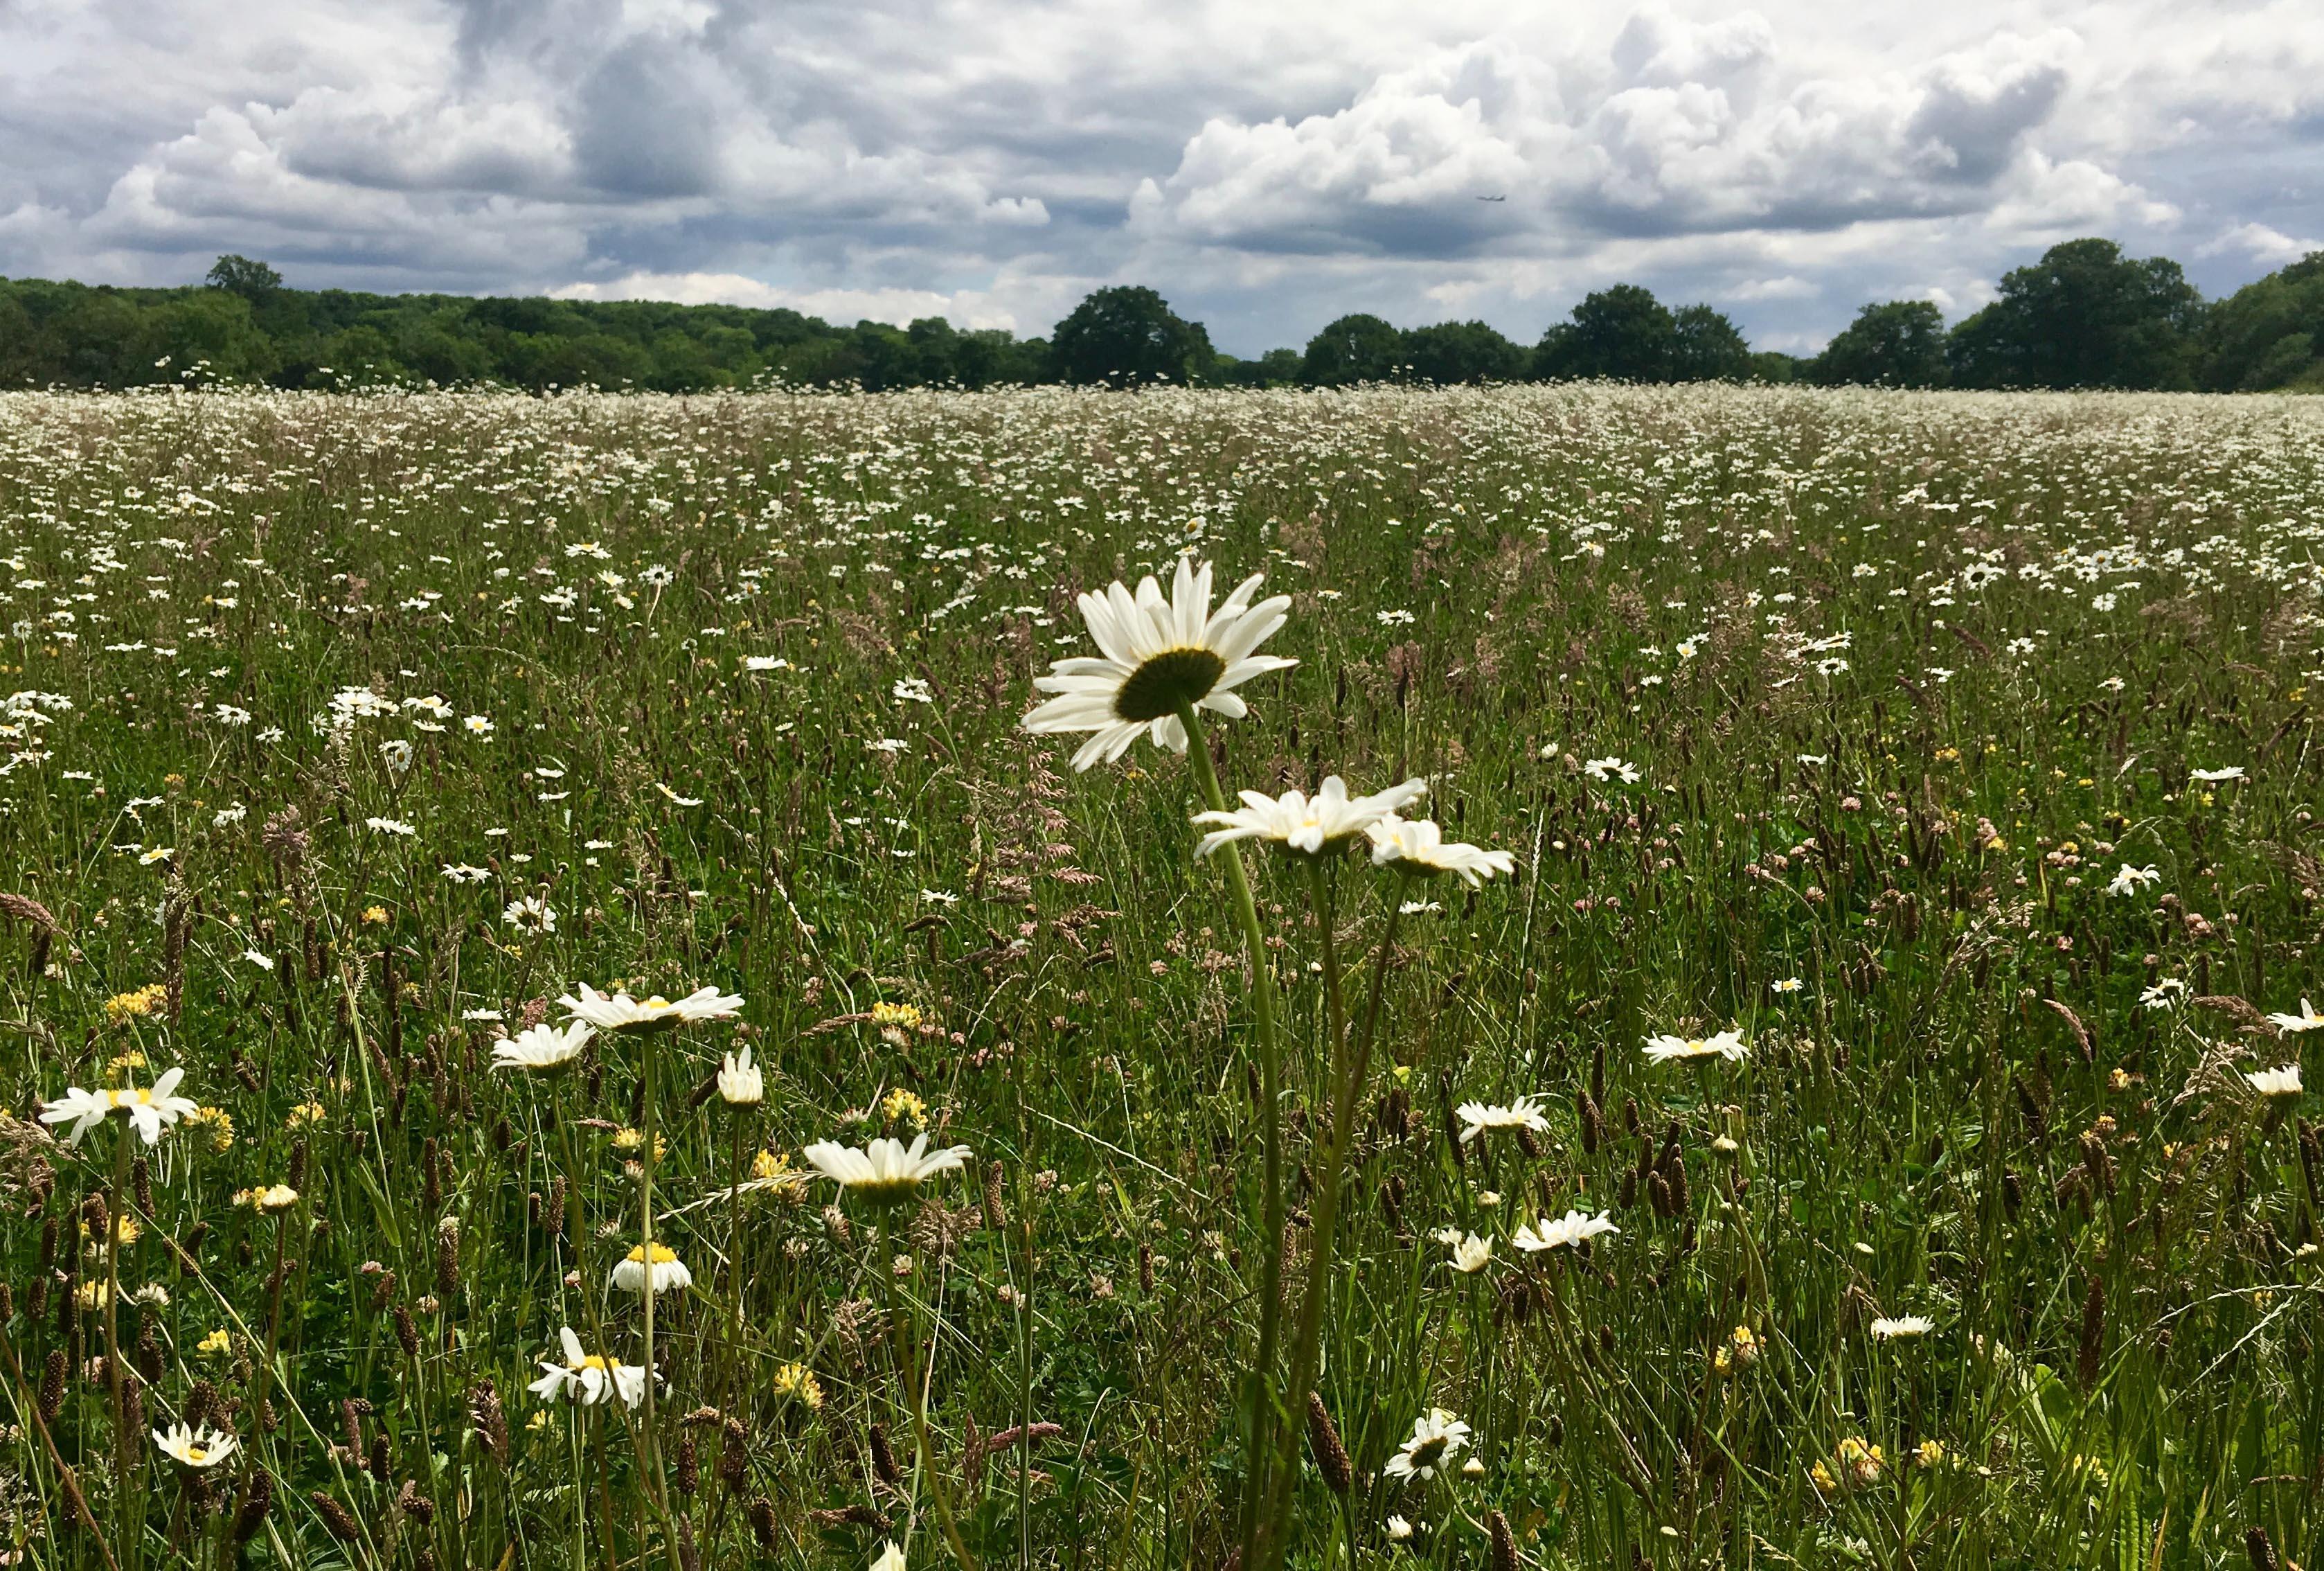 Chertsy Meadow, Shepperton, Greater London. Staycation Inspiration by Malvern Garden Buildings